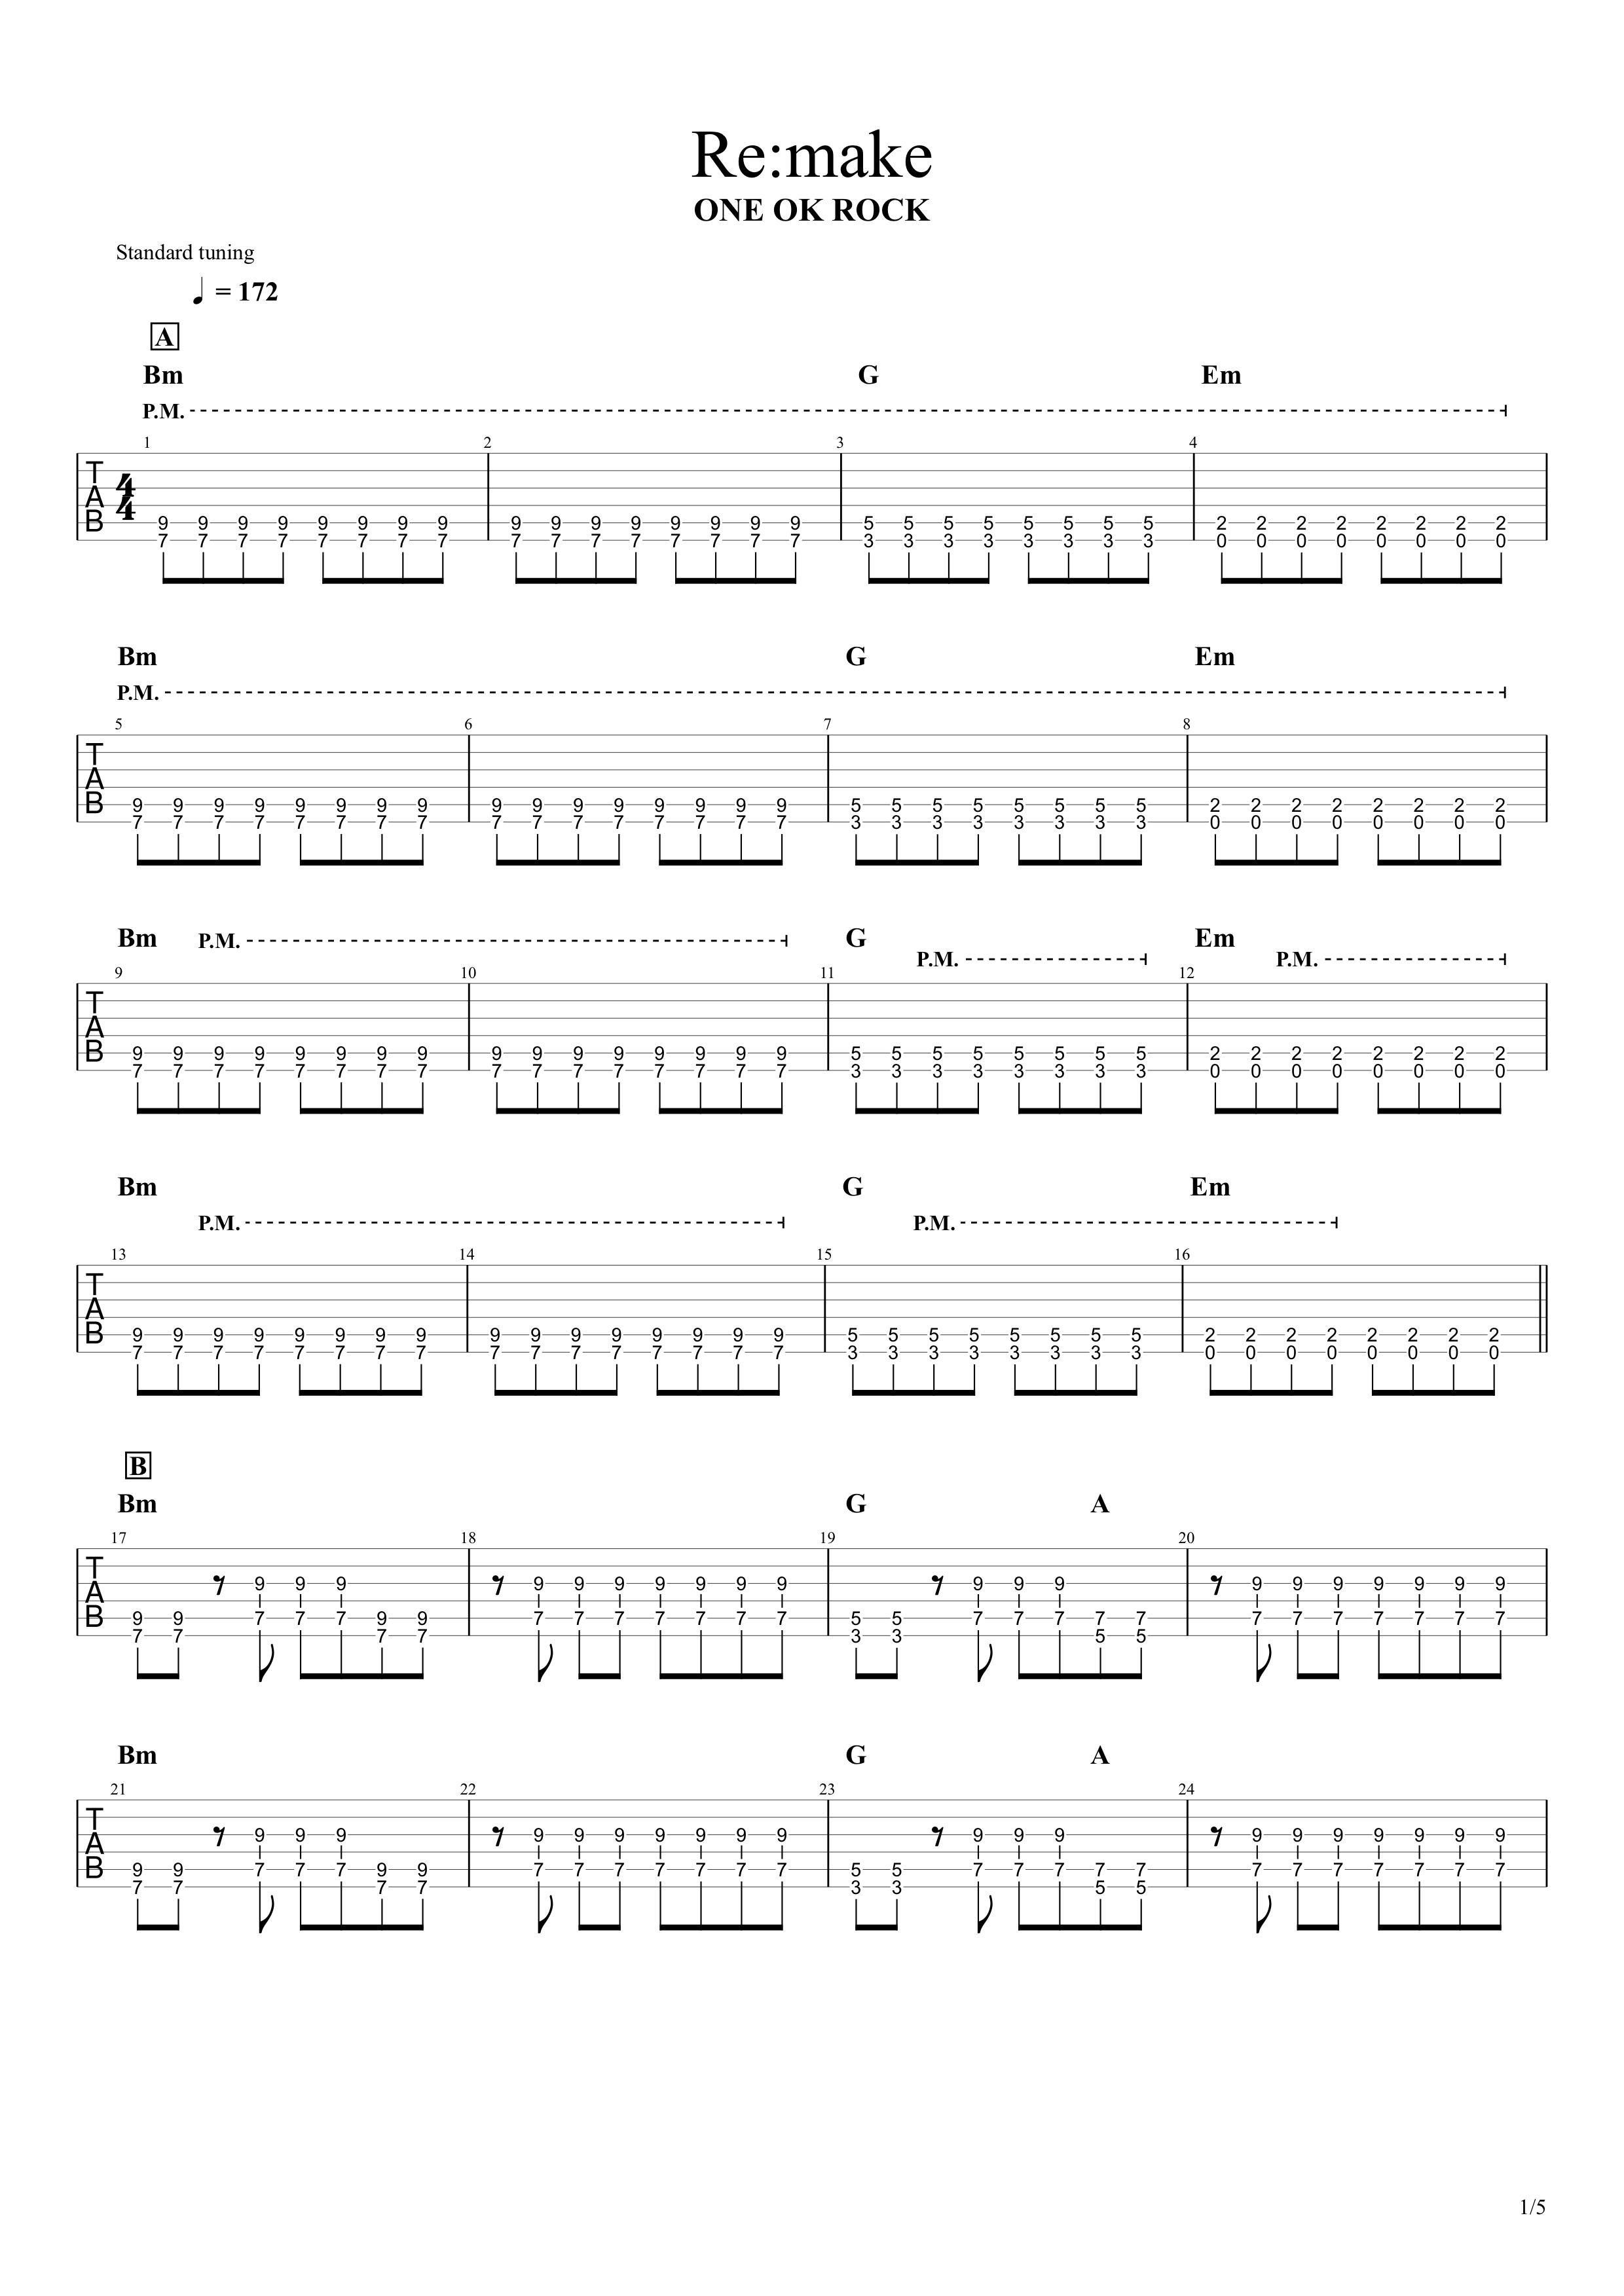 Re:make/ONE OK ROCK ギターTAB譜スコア01